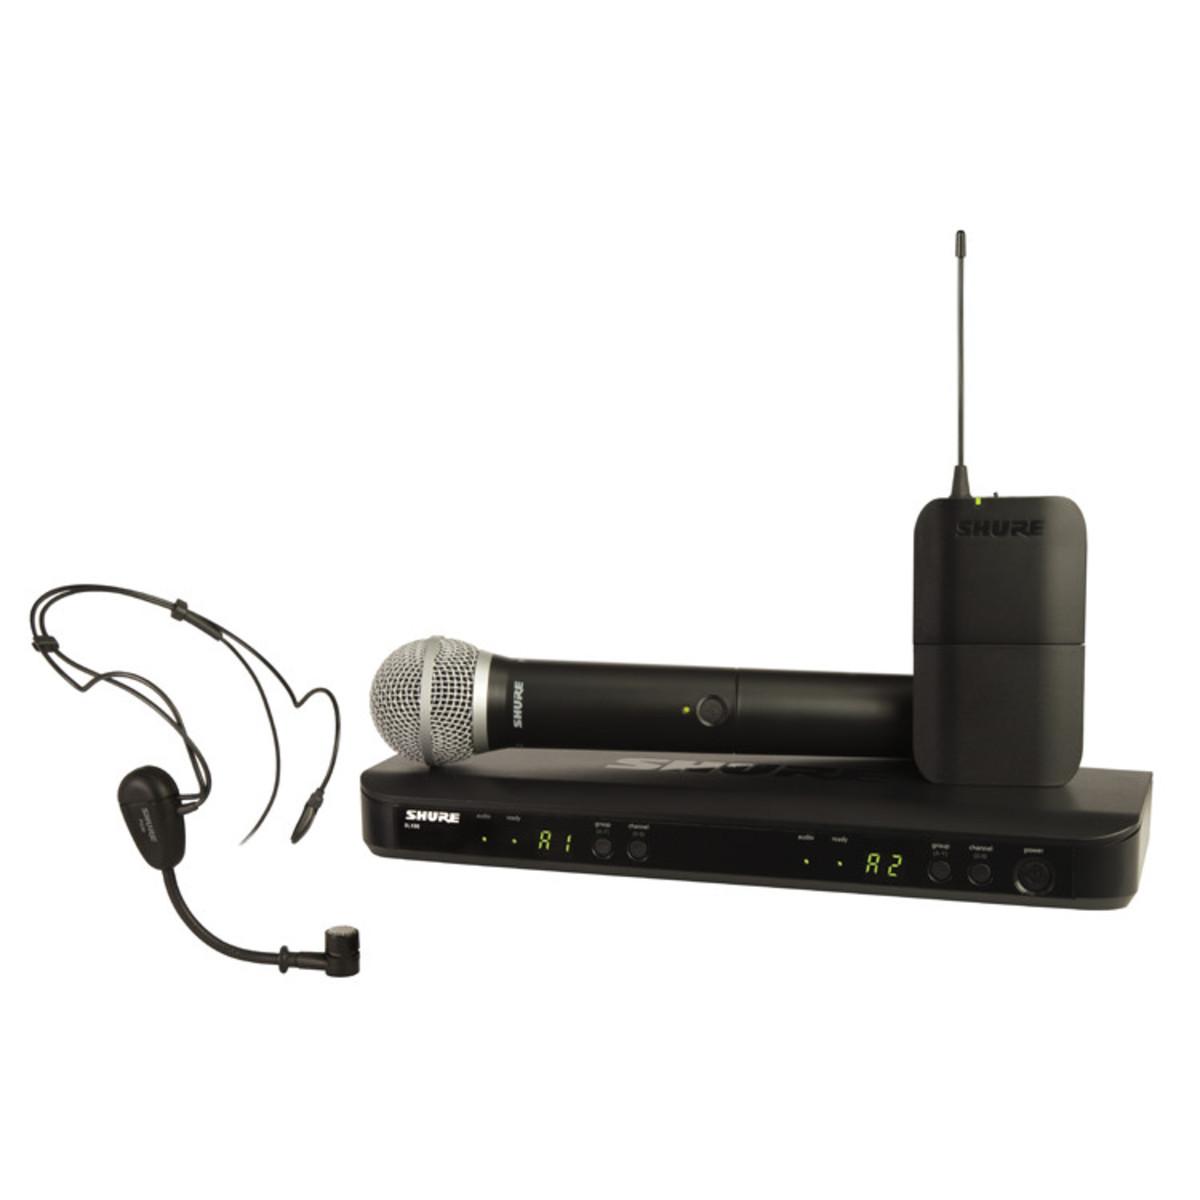 Shure Microphone System : Shure blx uk pg dual headset handheld wireless mic